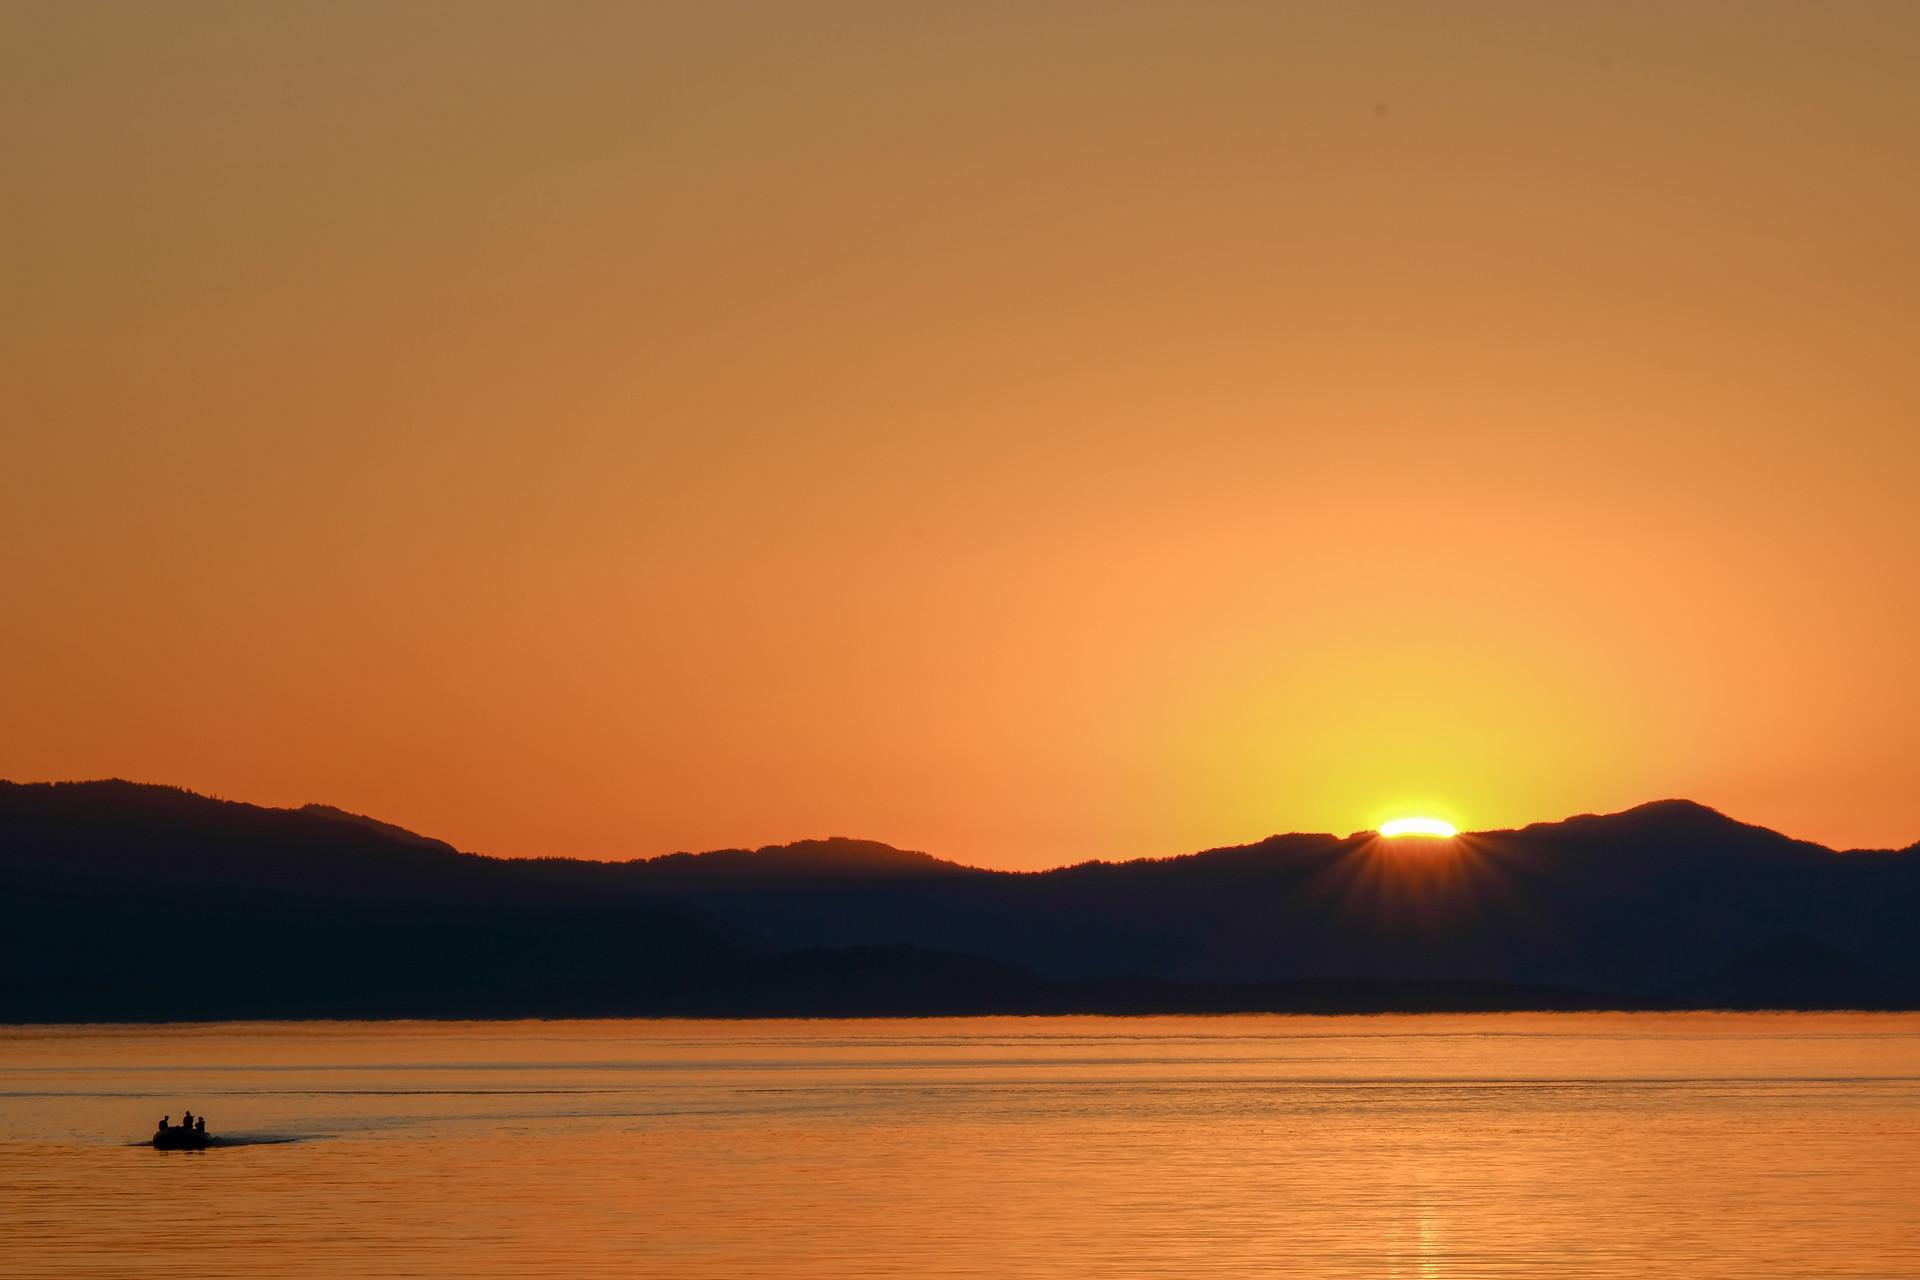 Sunset // skiff.